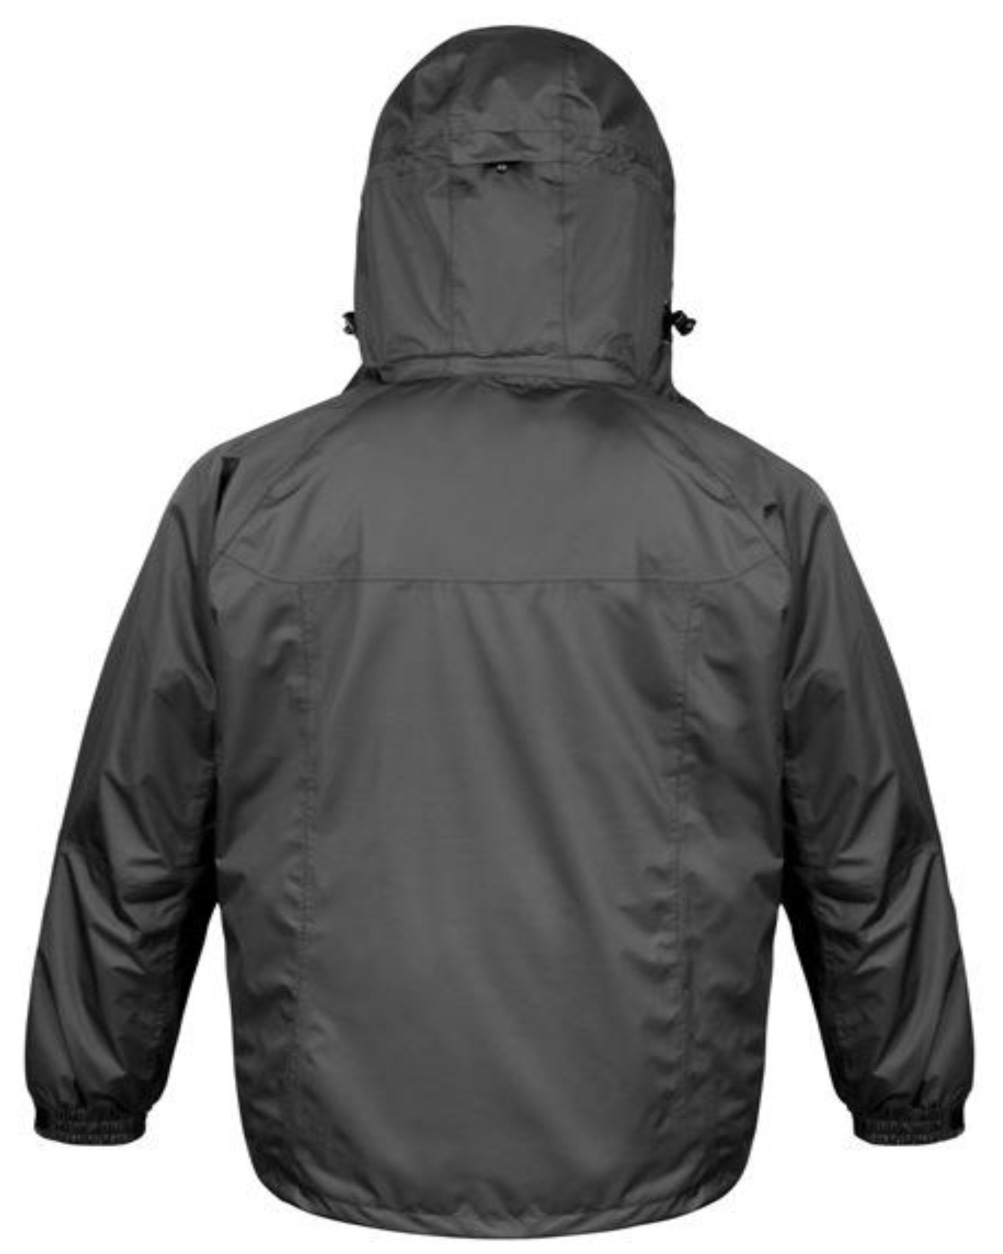 Men's 3 in 1 Waterproof Jacket